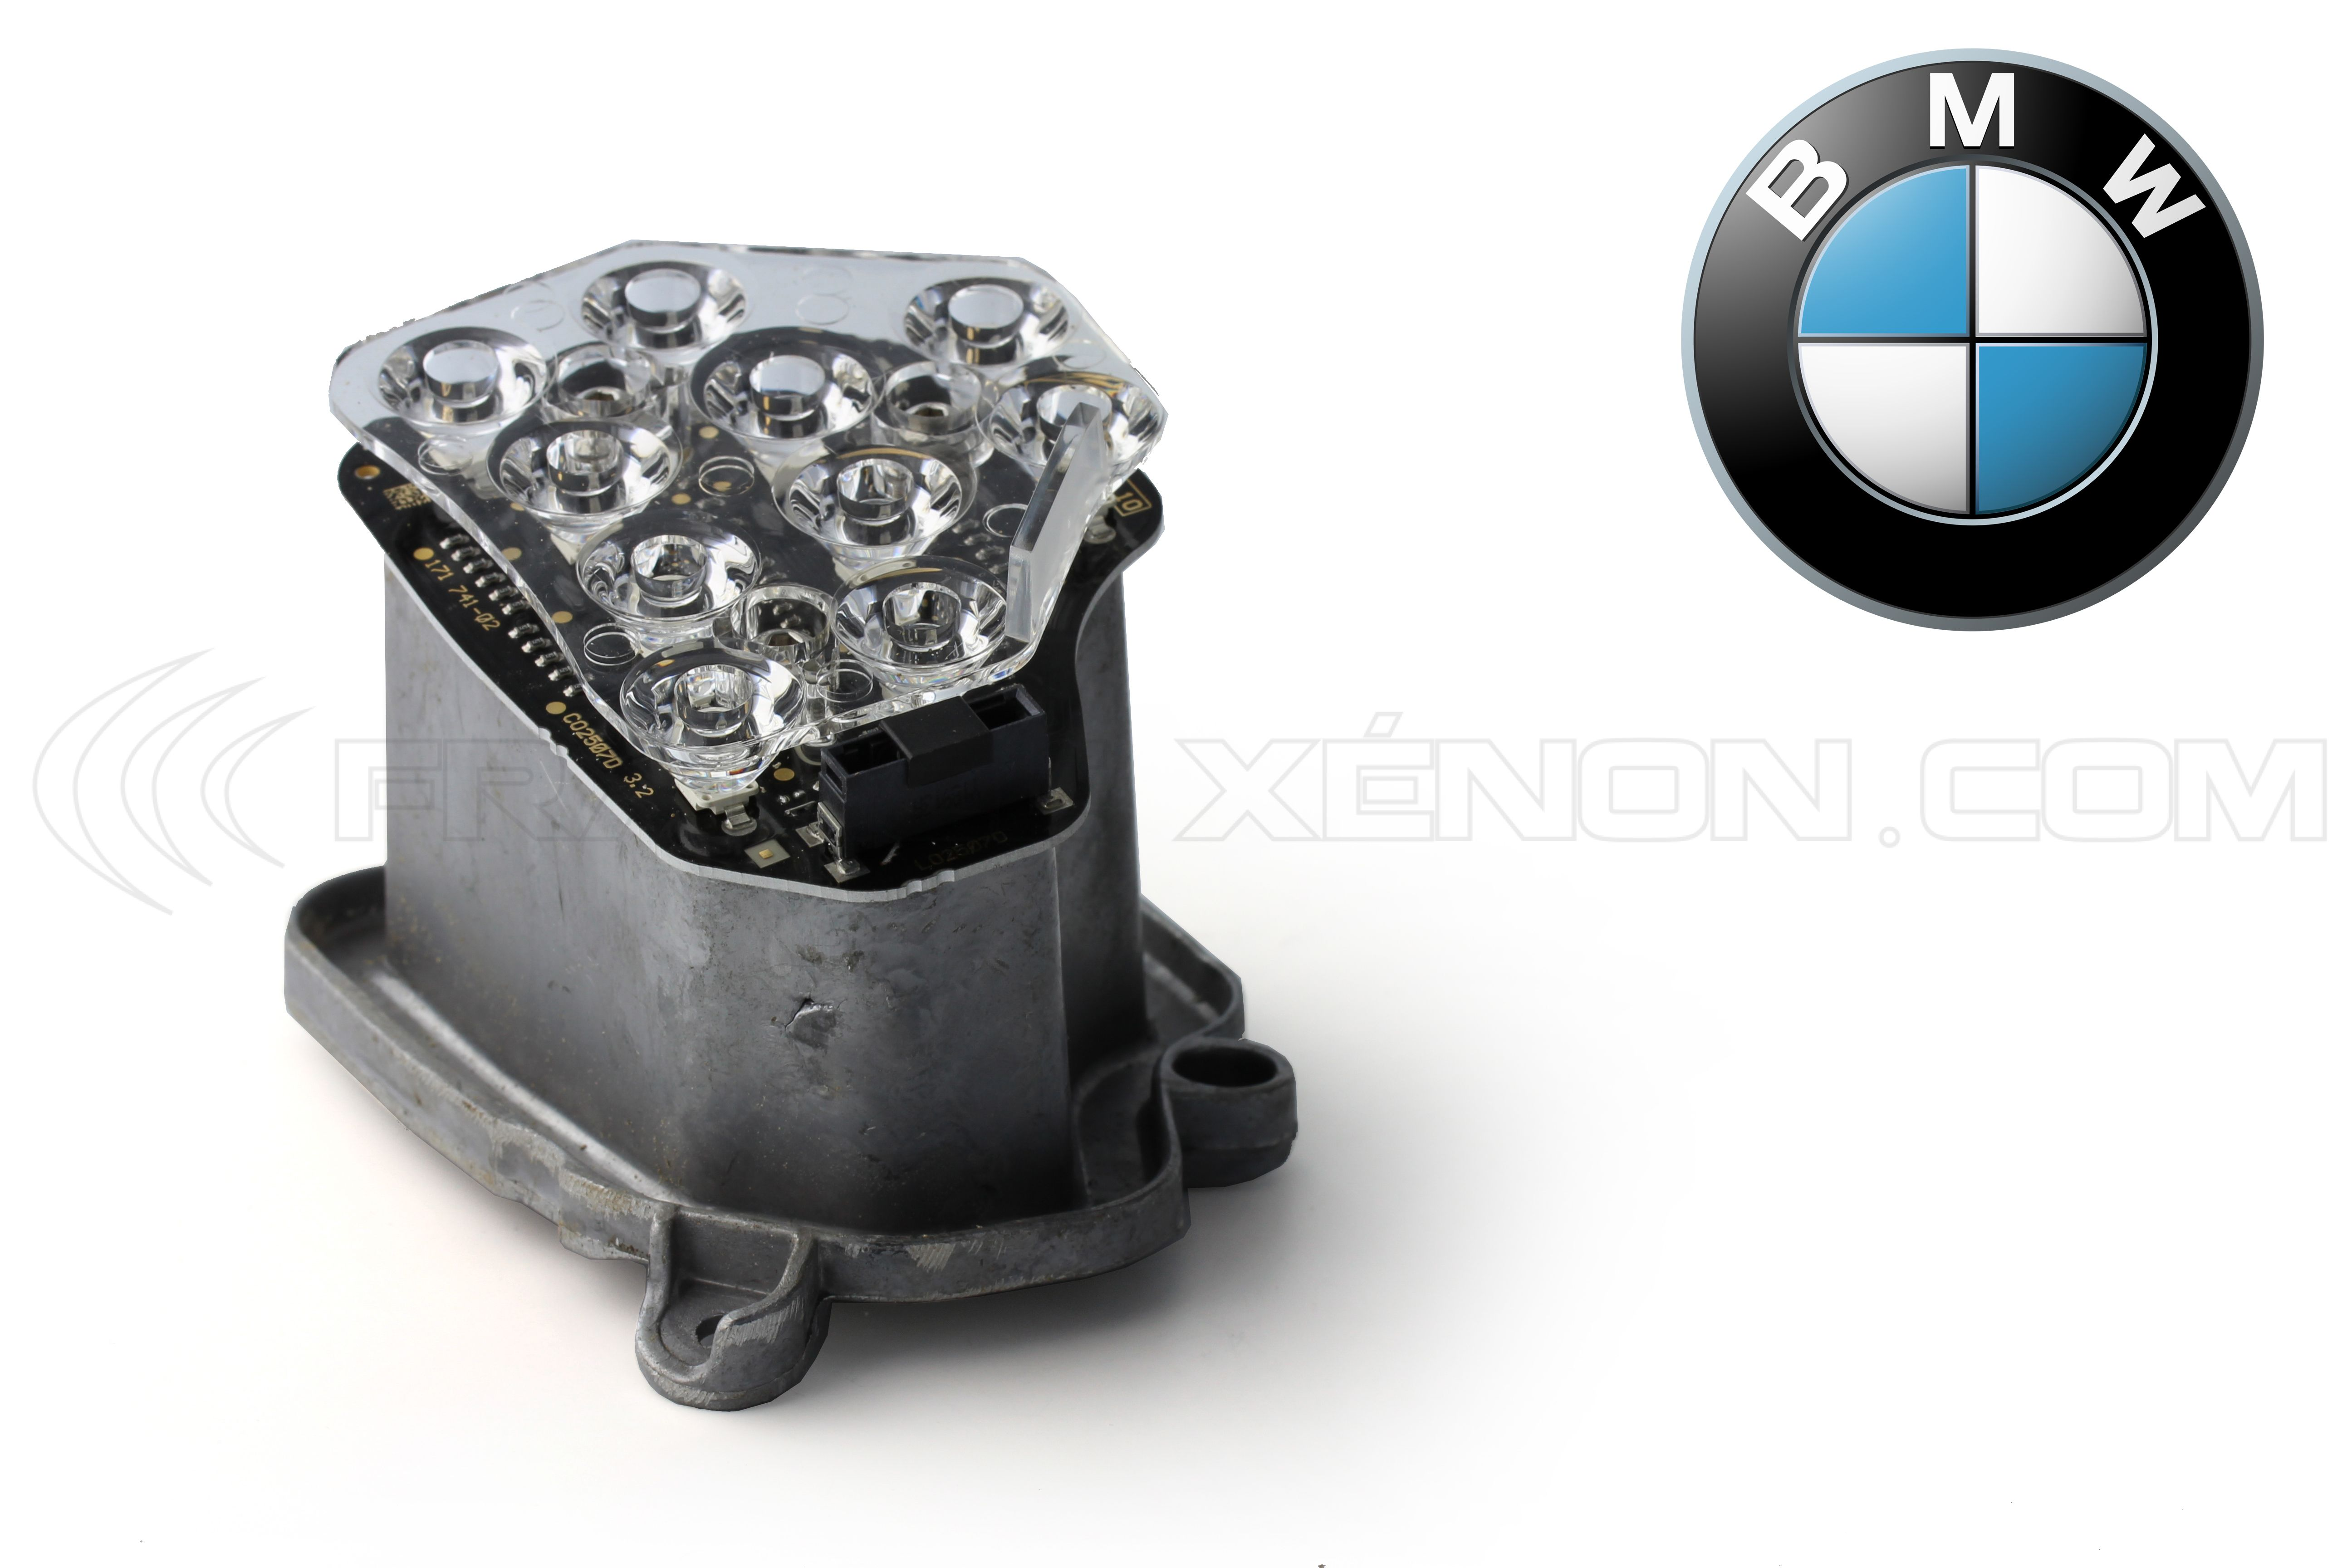 Bmw F07 Xenon Headlight Indicator Left Side 63127262833 Insert Turn Audio By 741 Signal France